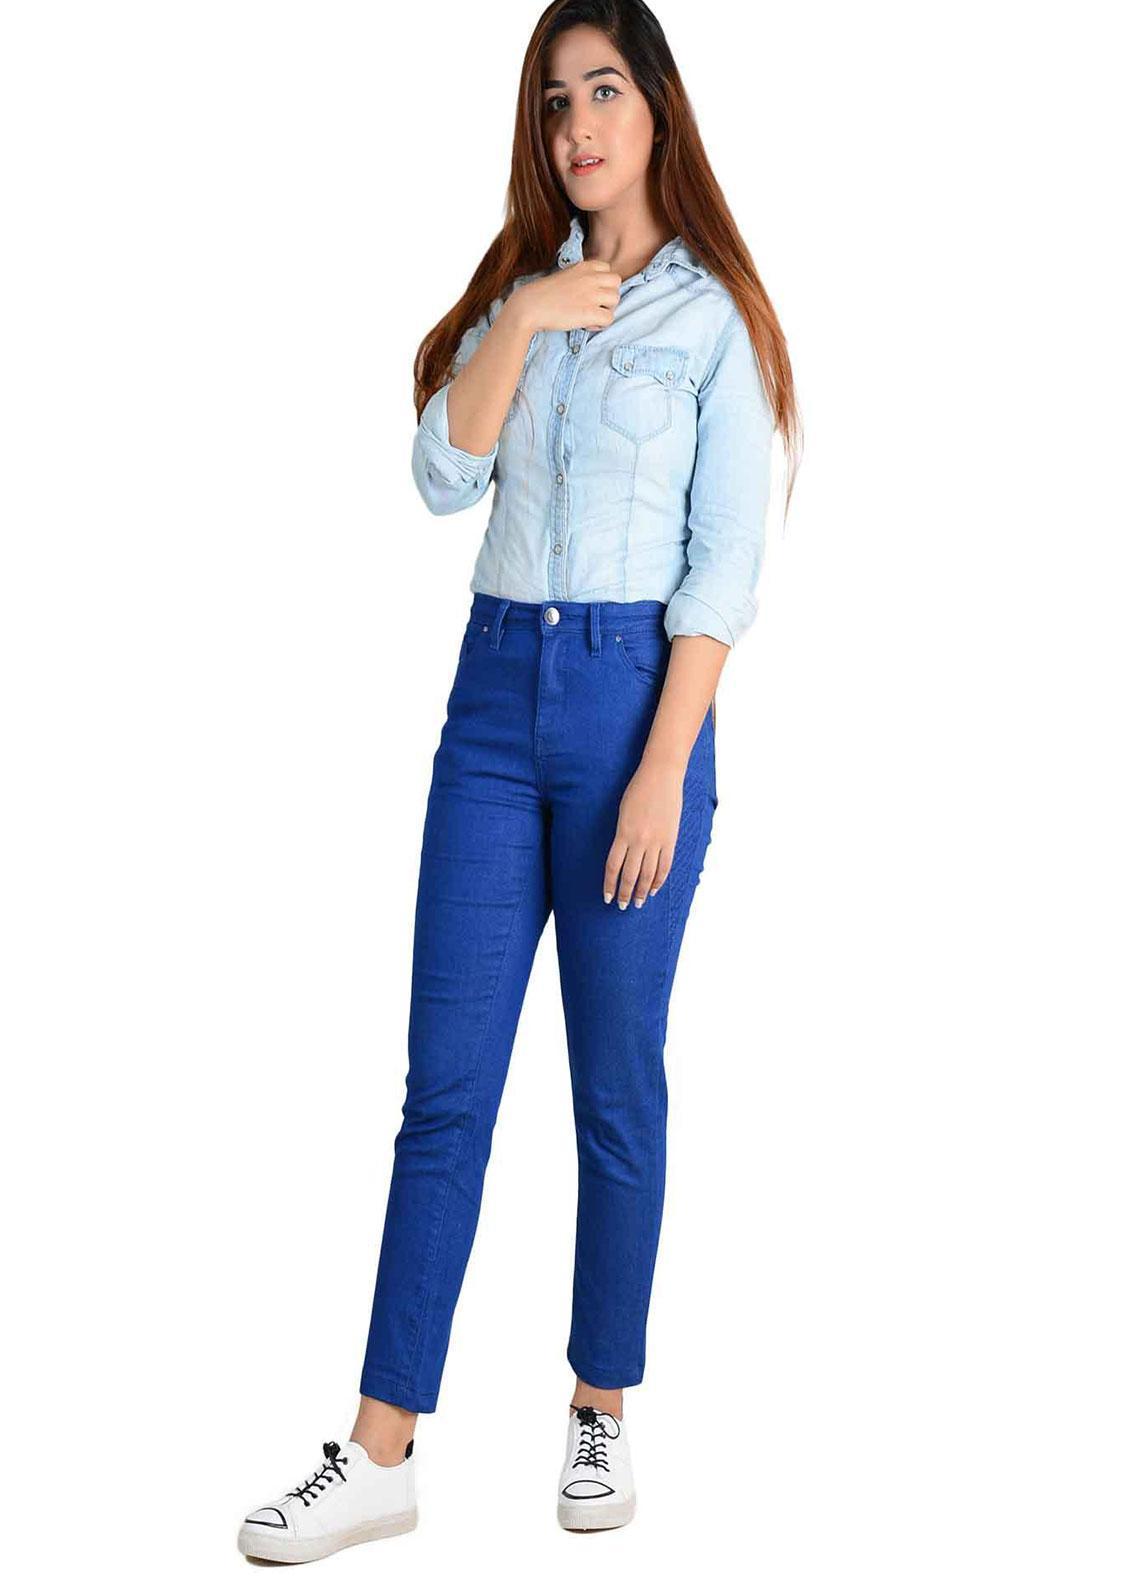 Ignite Wardrobe Stretchable Cotton Slim Fit Pants IG20PNW 007